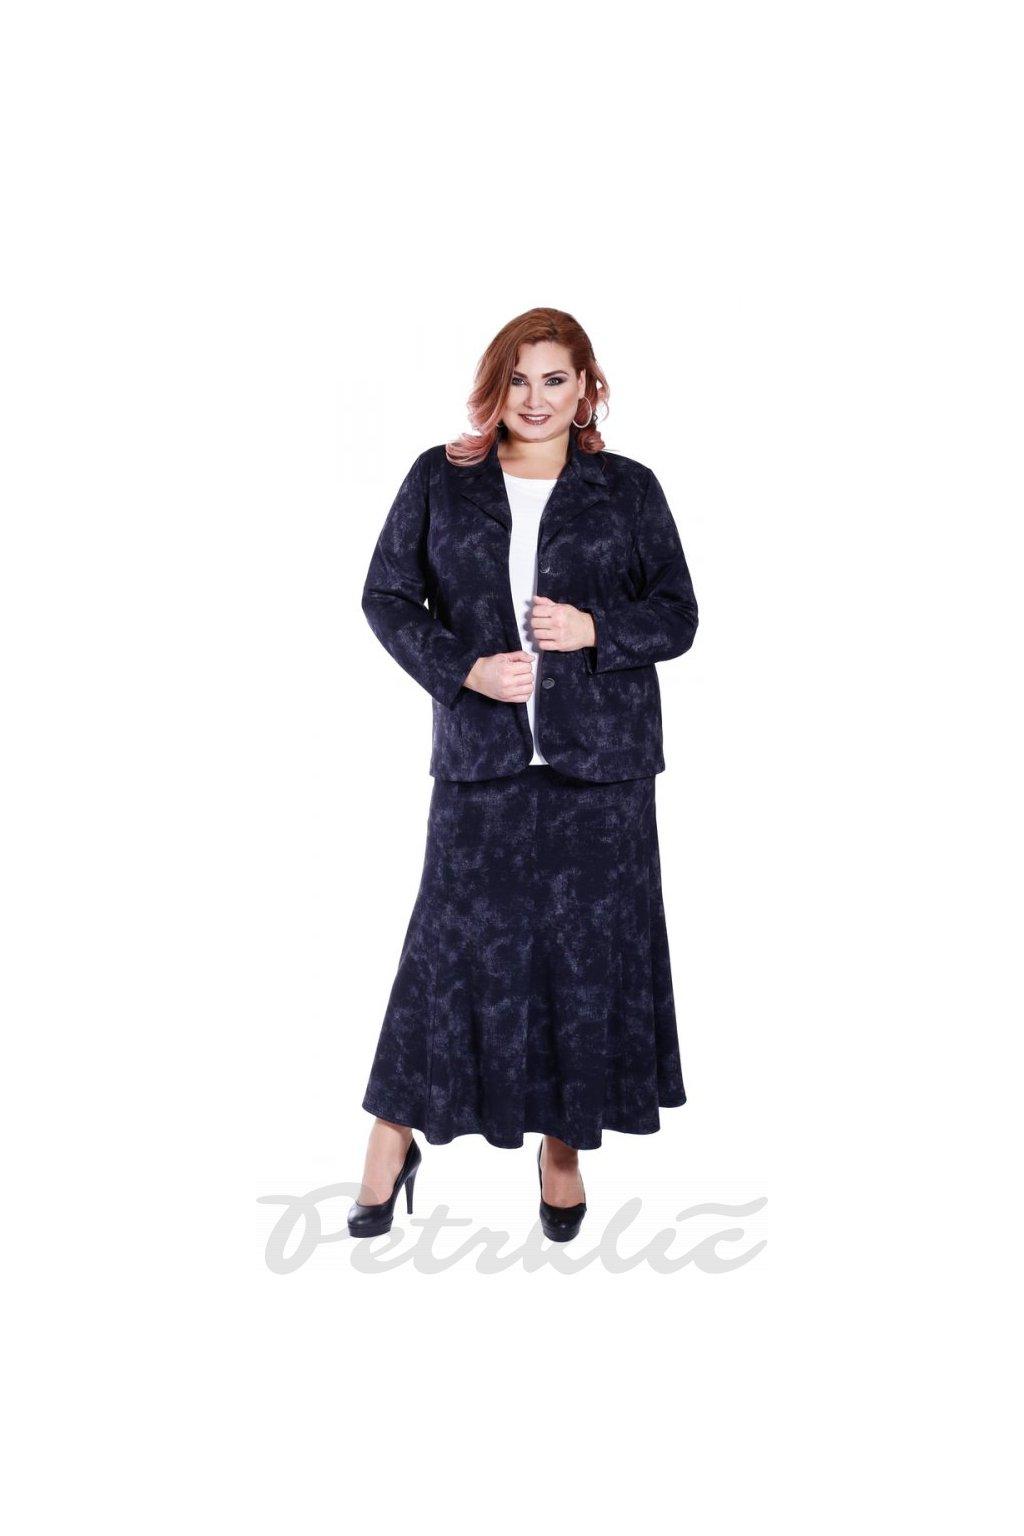 BABETA - sukně 80 - 85 cm